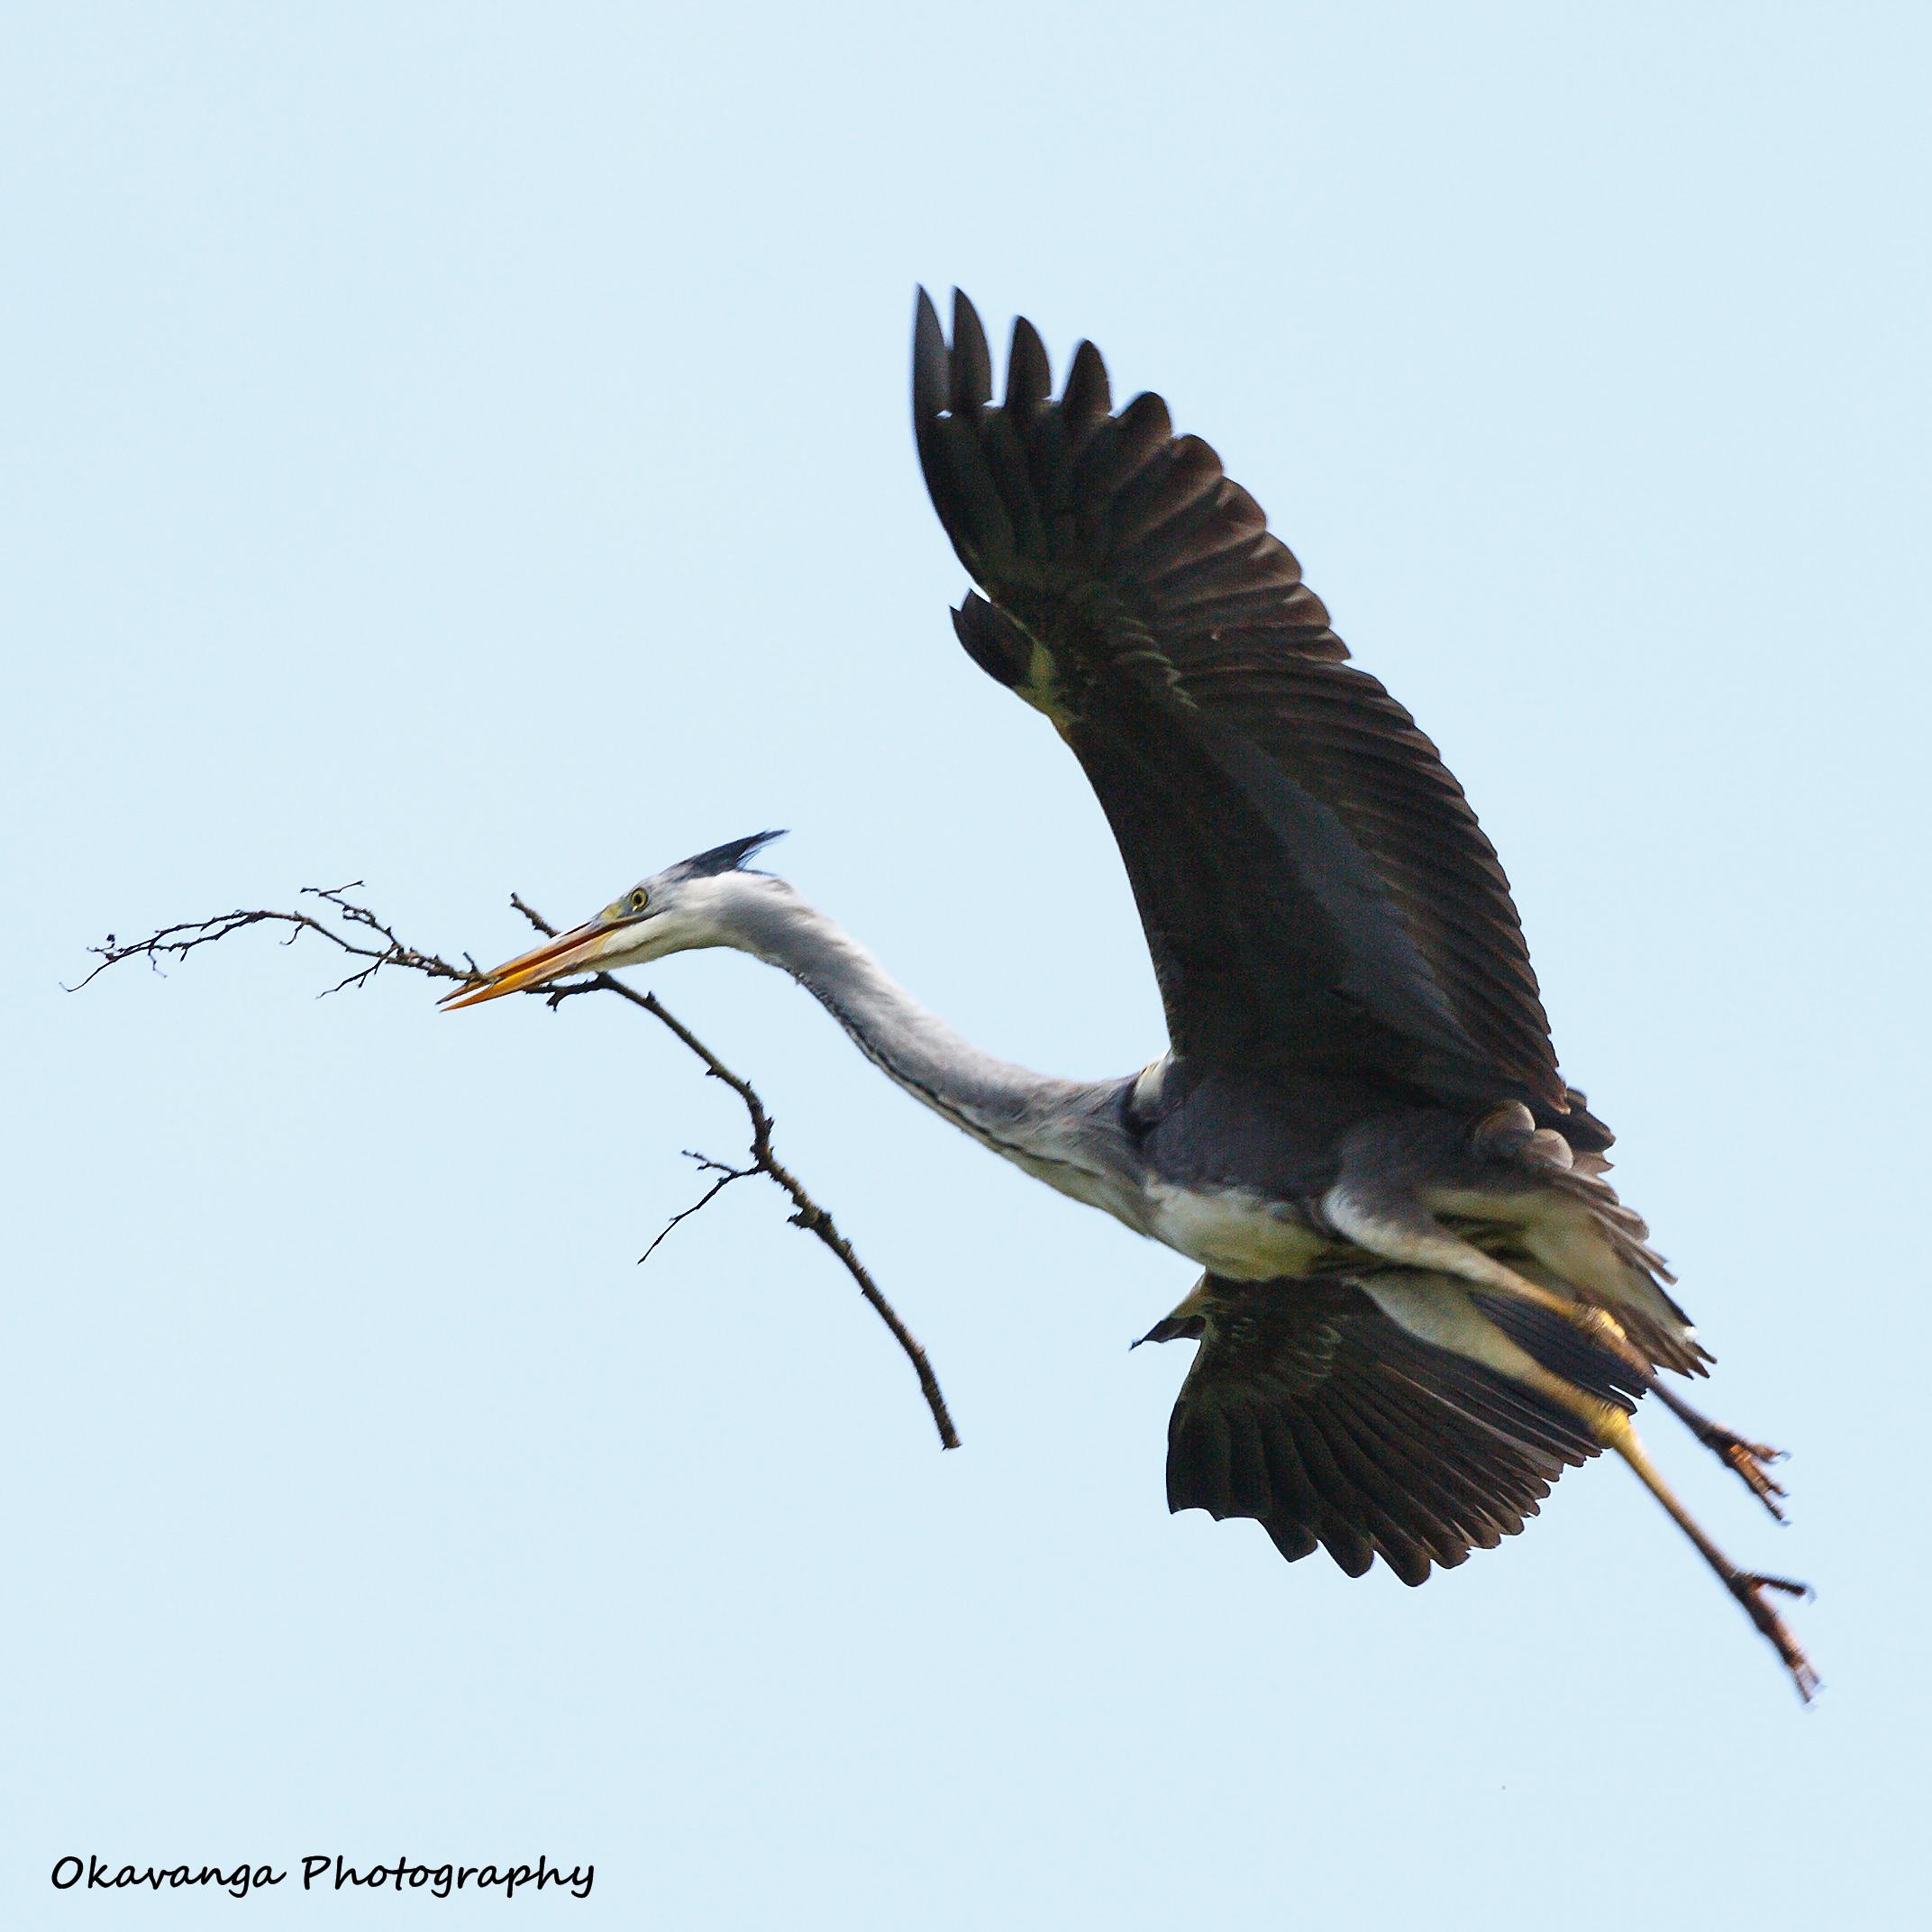 Heron 1 - The Repairman by Okavanga